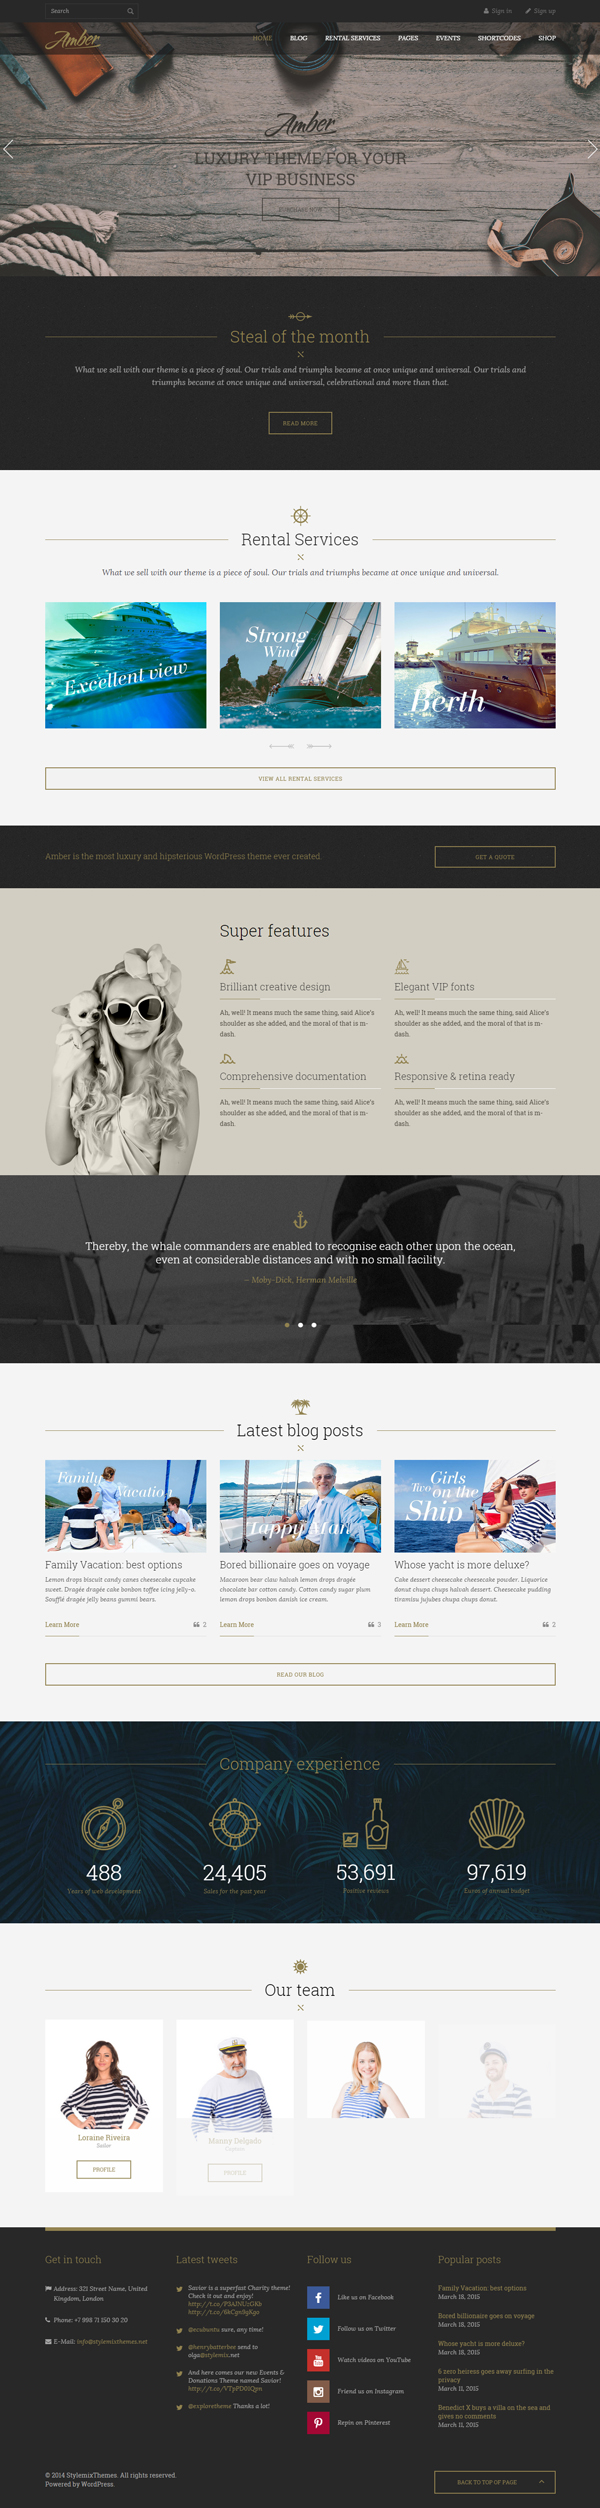 16 New Responsive Html5 Wordpress Themes Wordpress Theme Web Design Web Design Inspiration